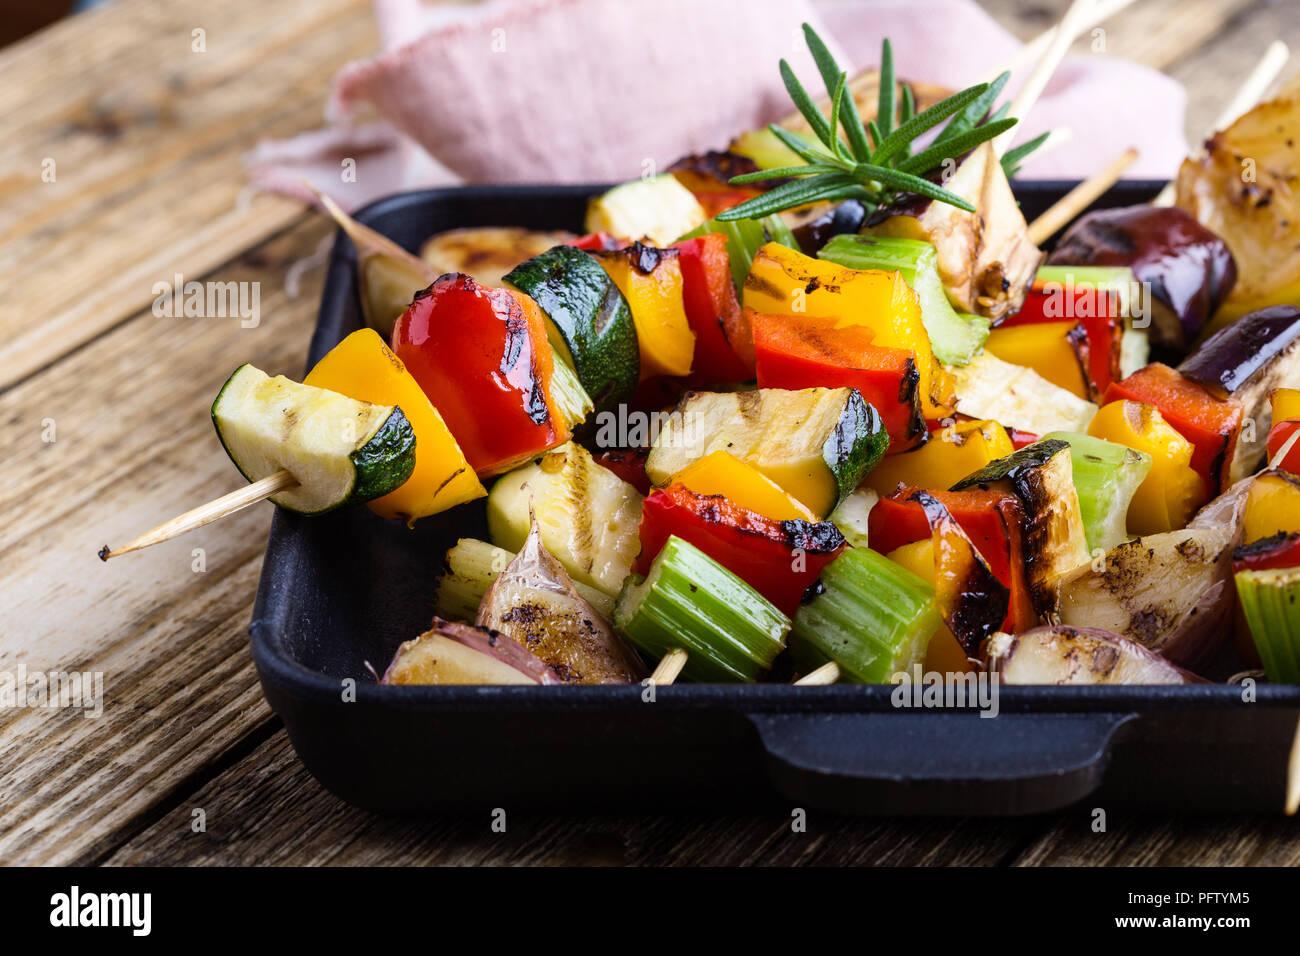 Coloridas brochetas de verduras asadas en sartén de hierro fundido. Vegan meal de verano sobre mesa de madera rústica Foto de stock